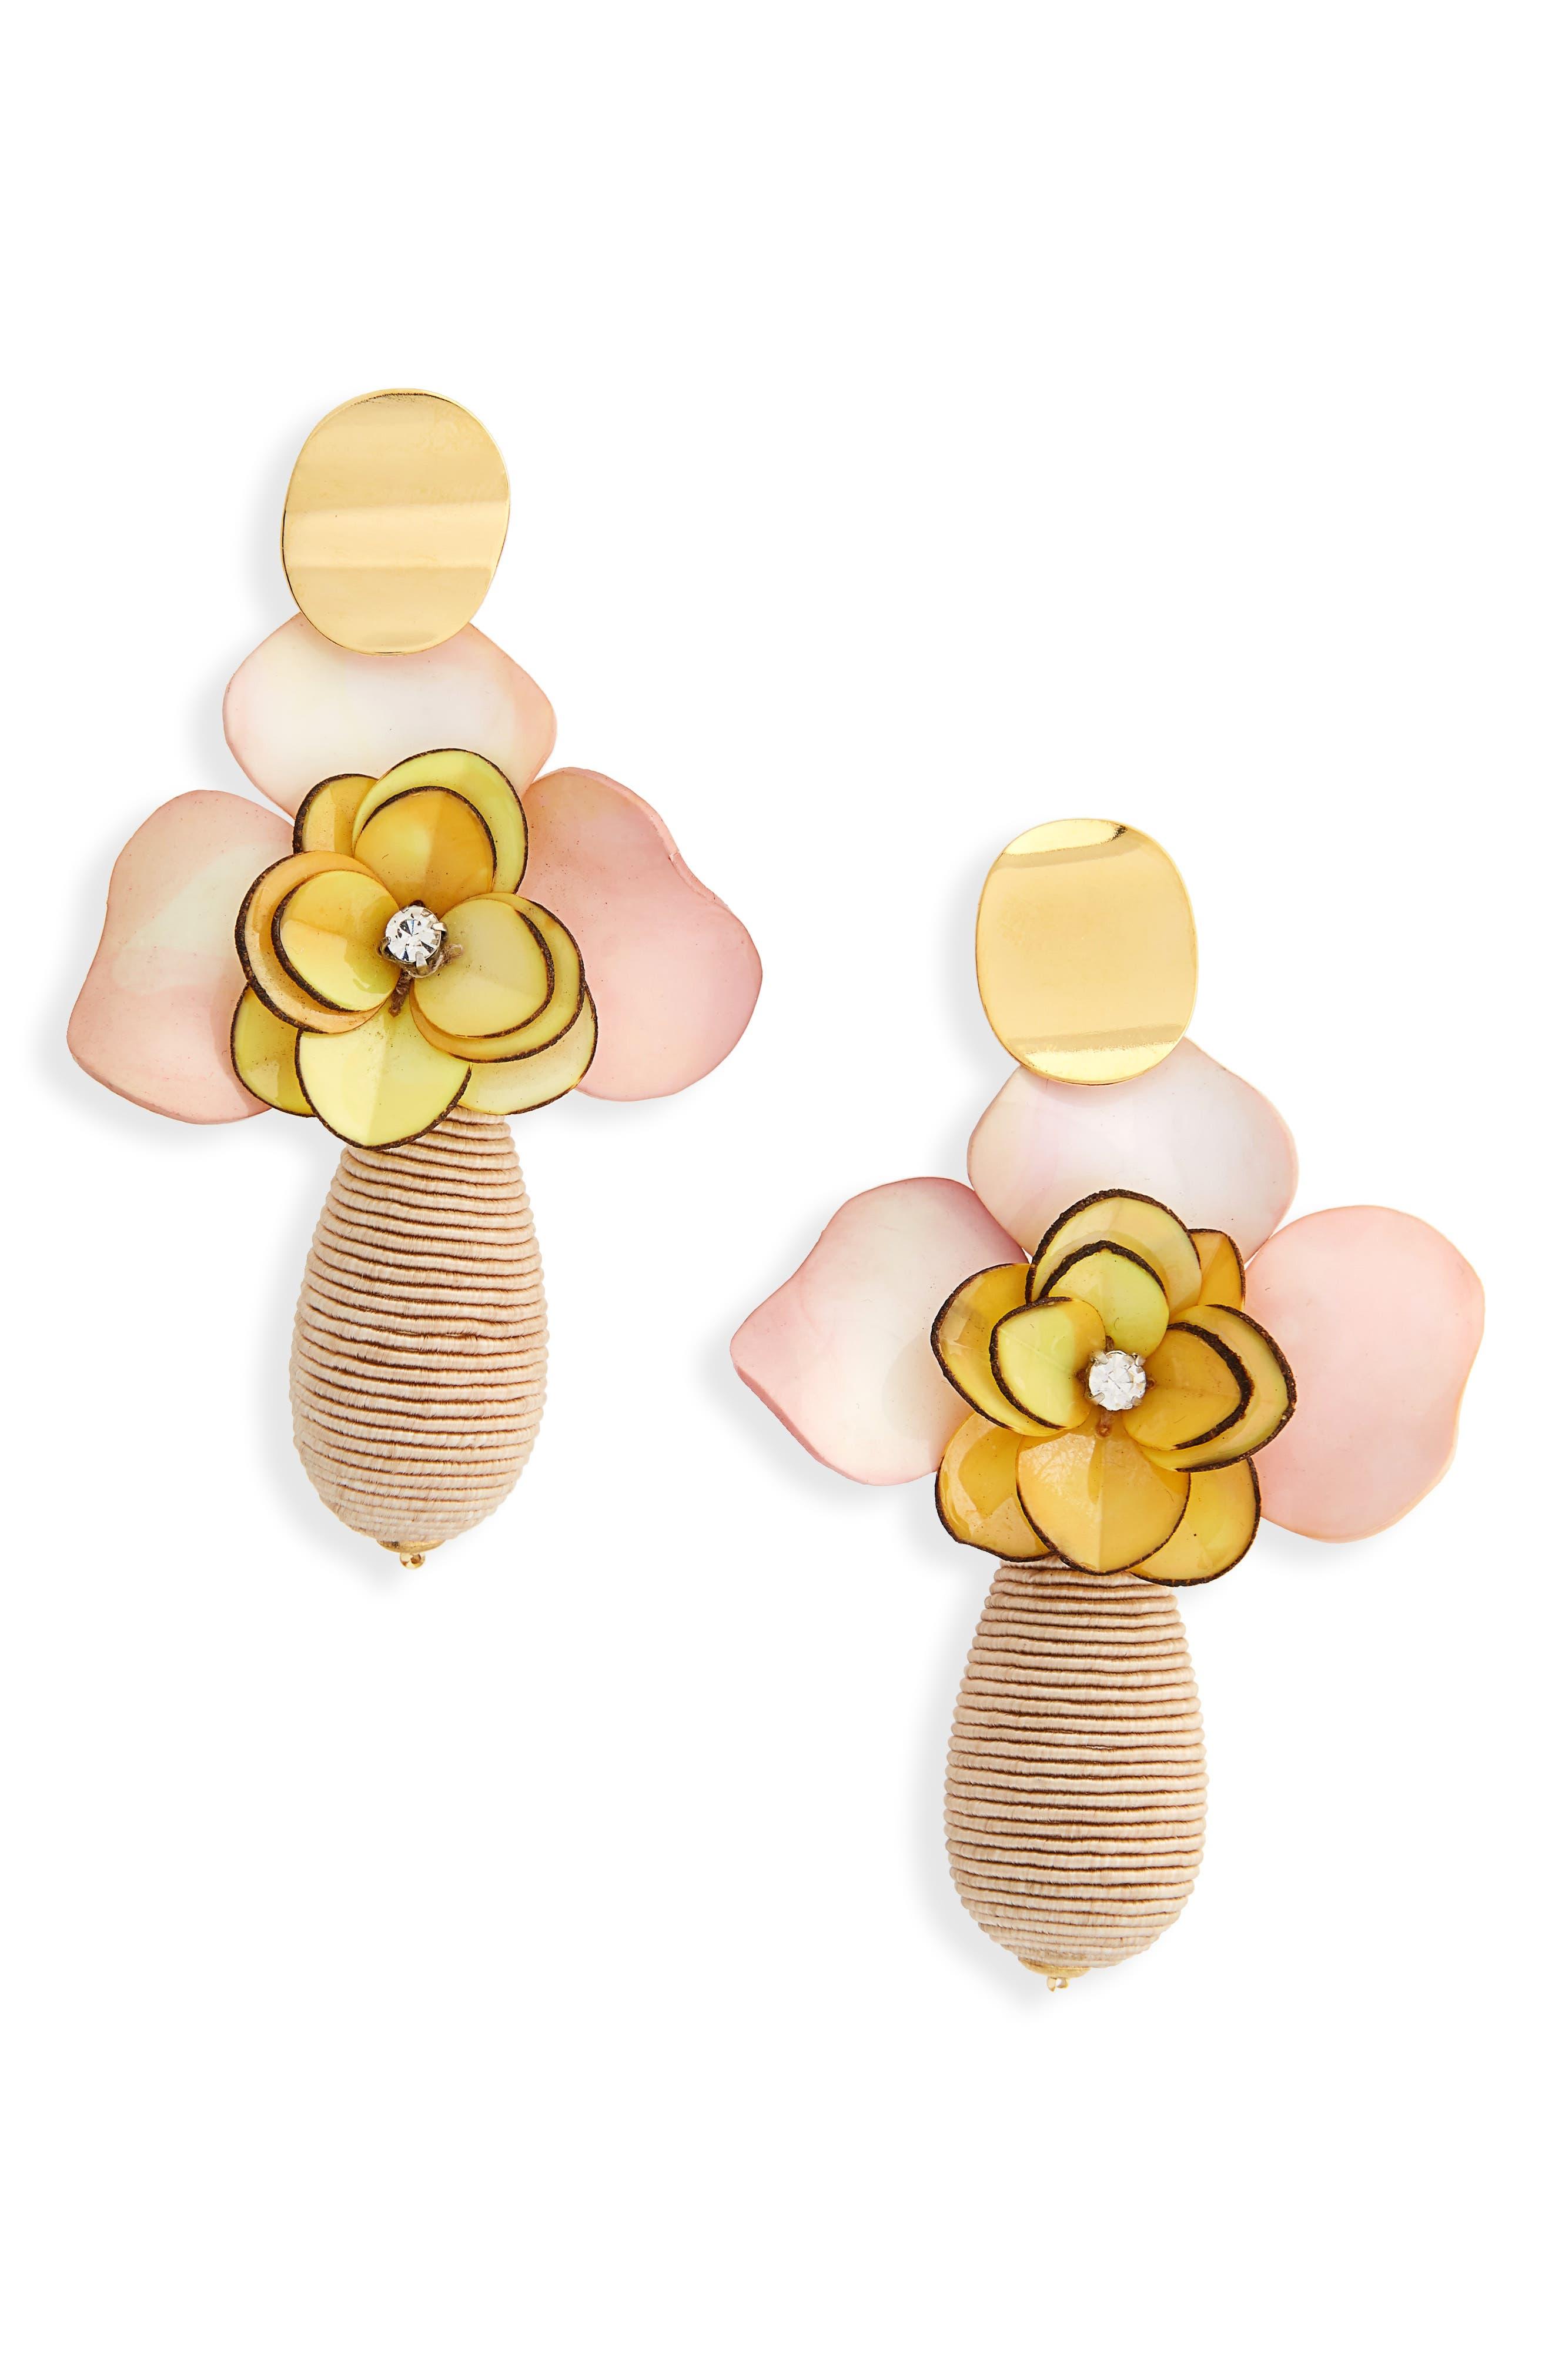 Magnolia Drop Earrings,                         Main,                         color, 250